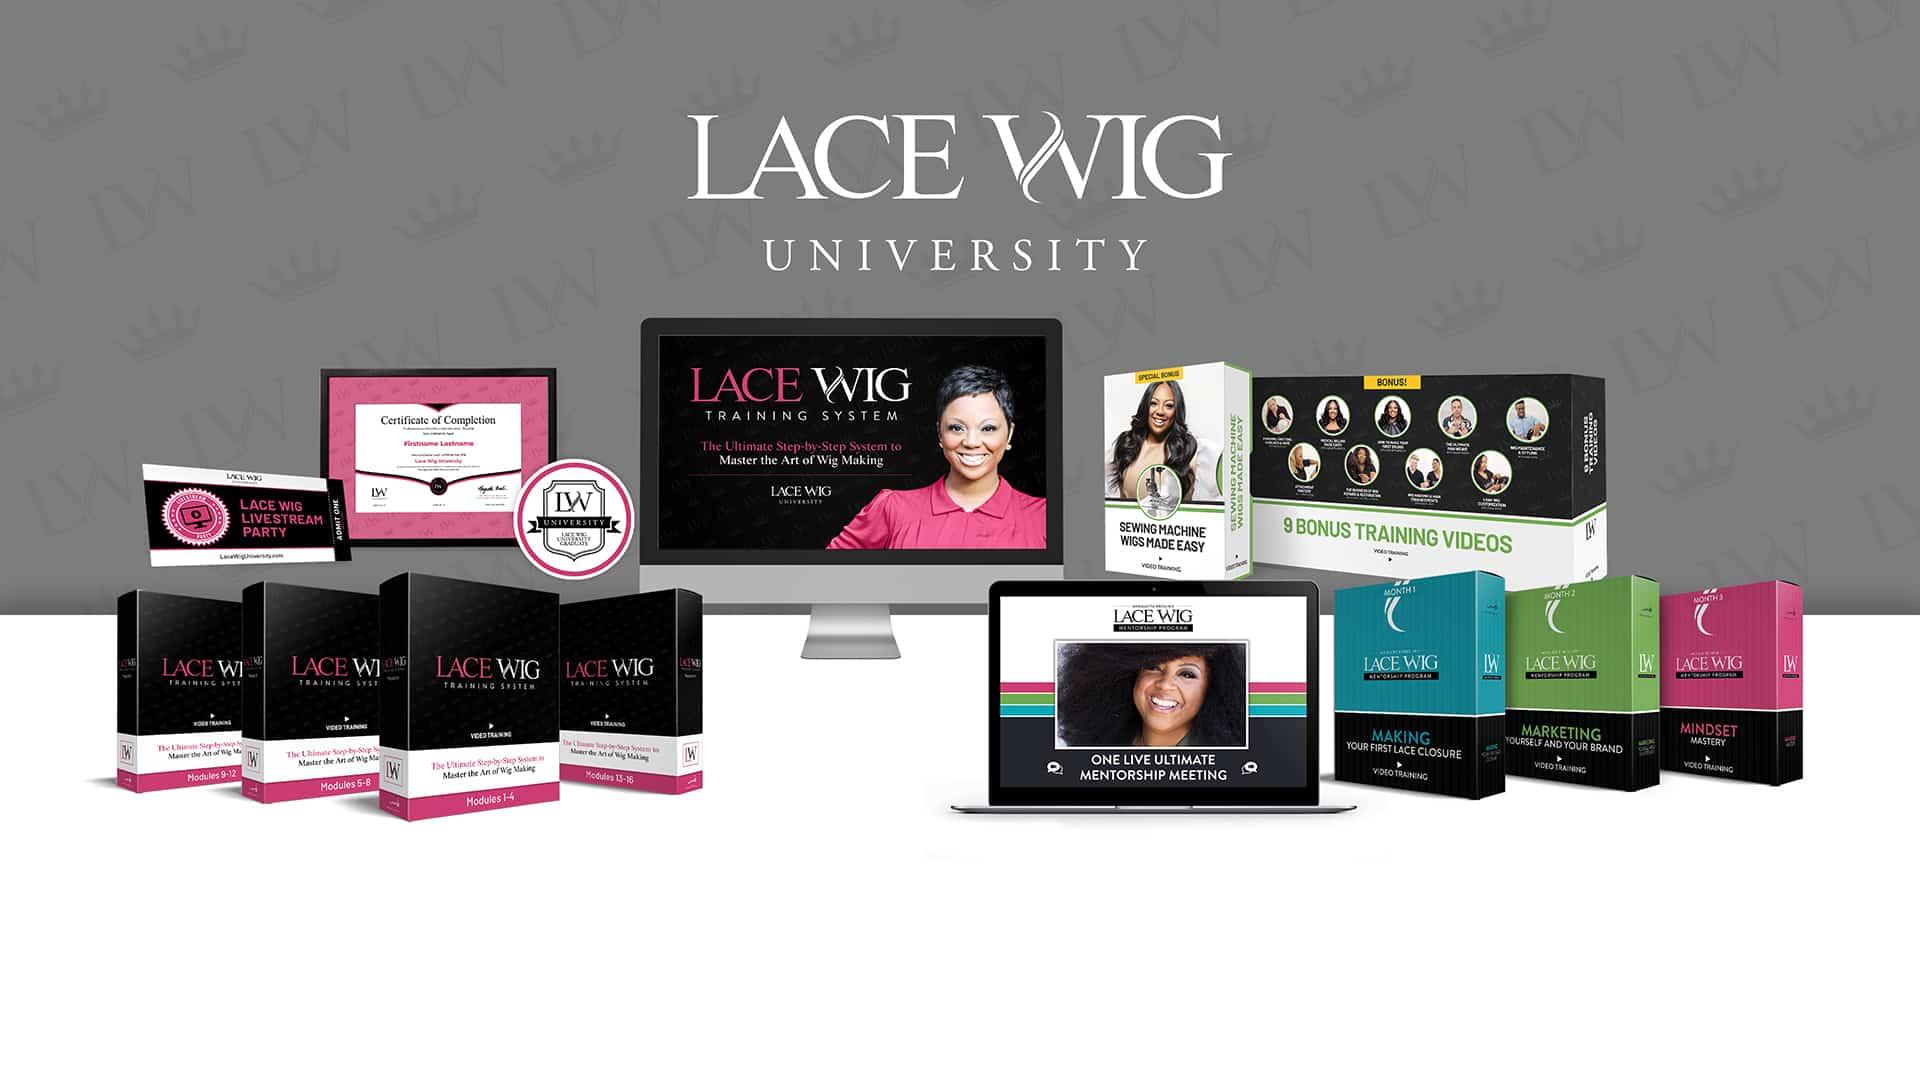 Lace Wig University